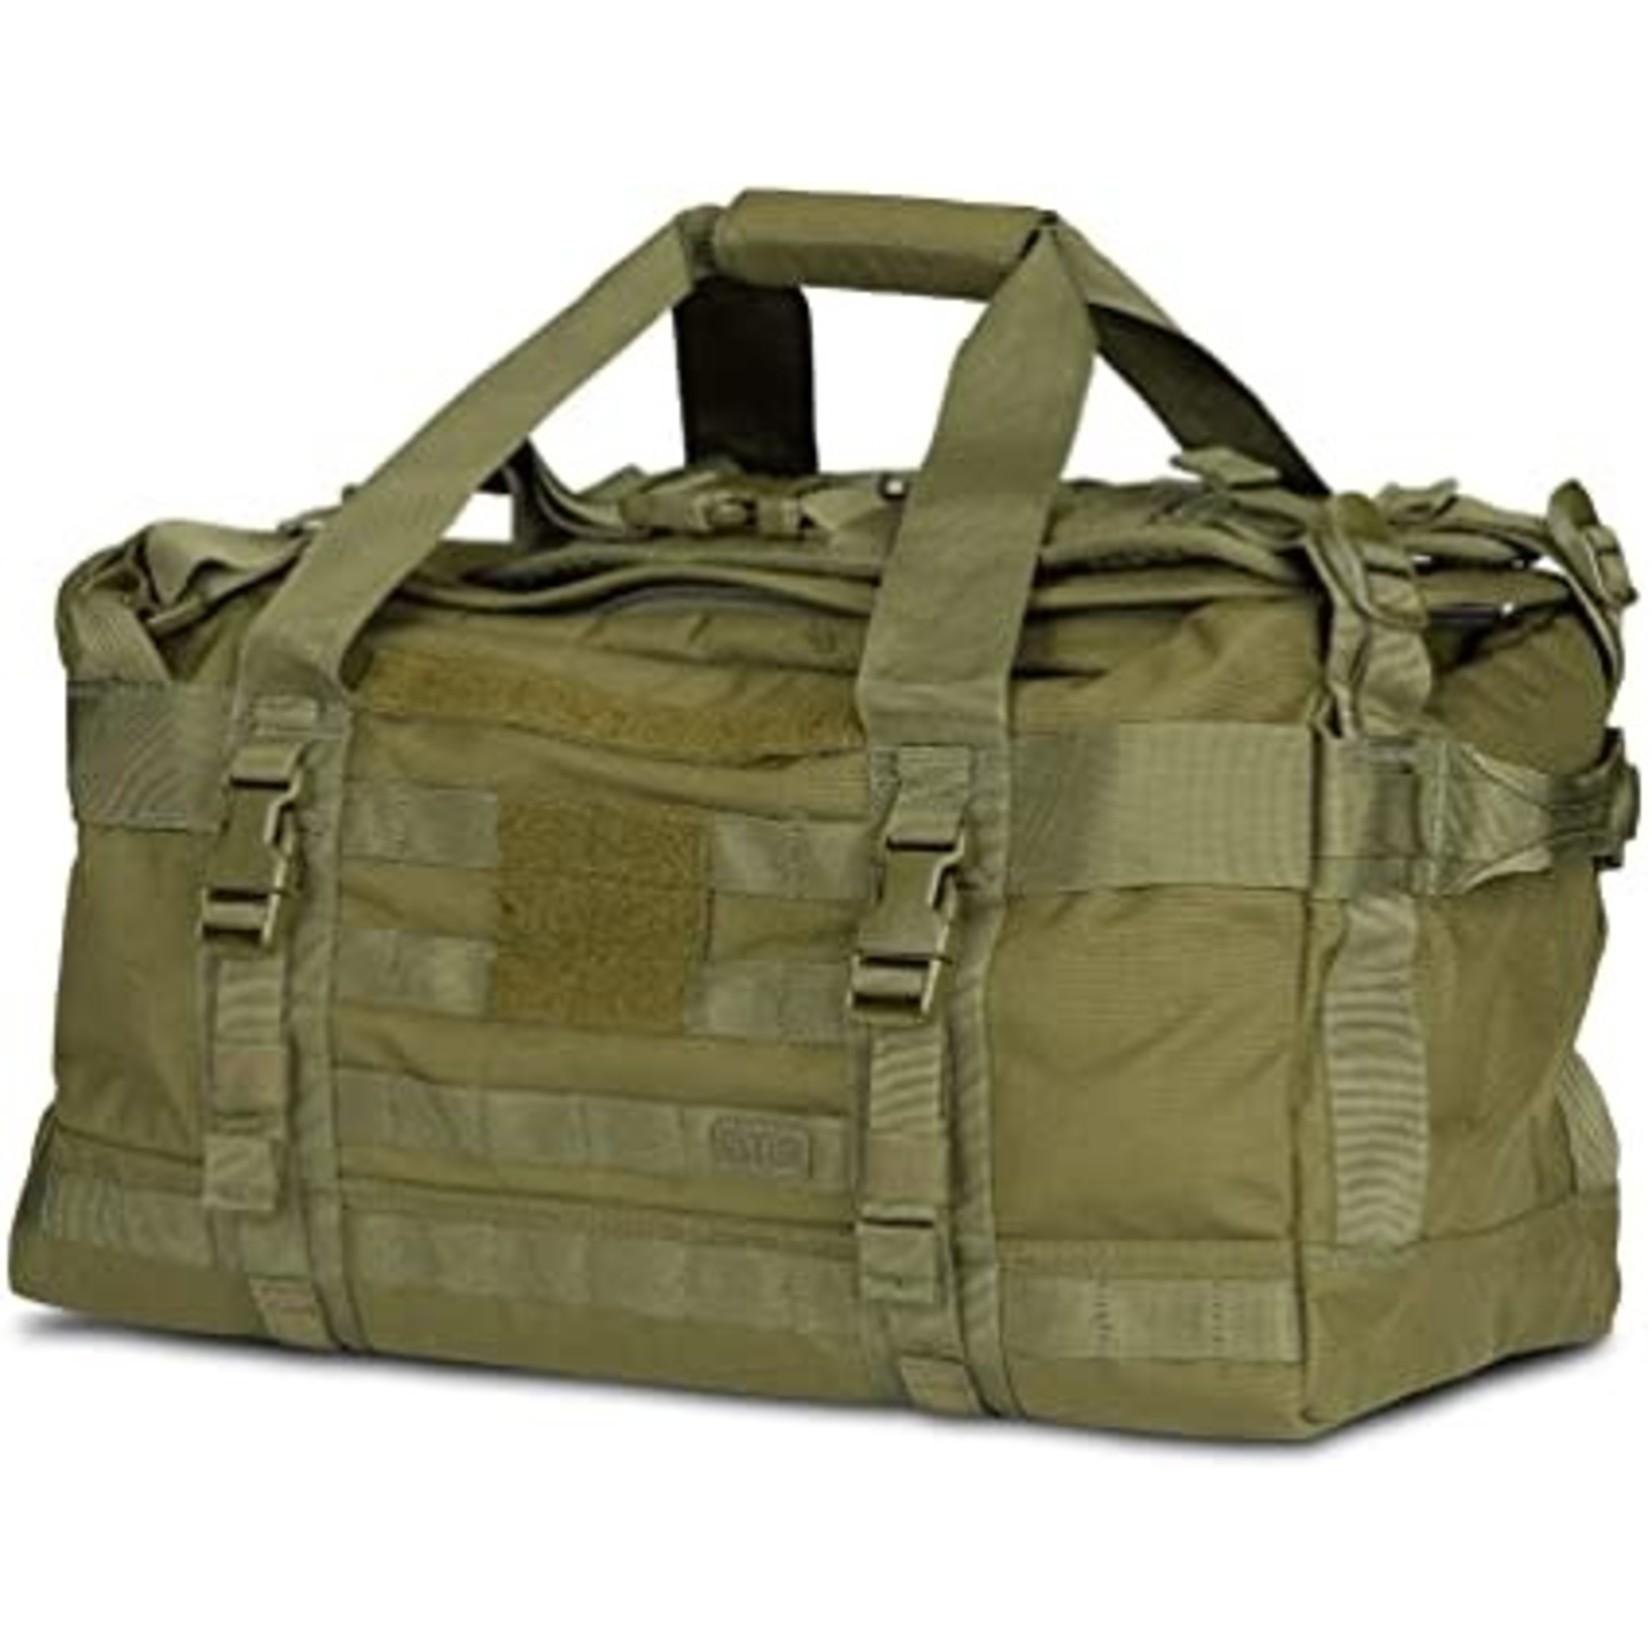 5.11 Tactical 5.11 Rush LBD Mike Bag